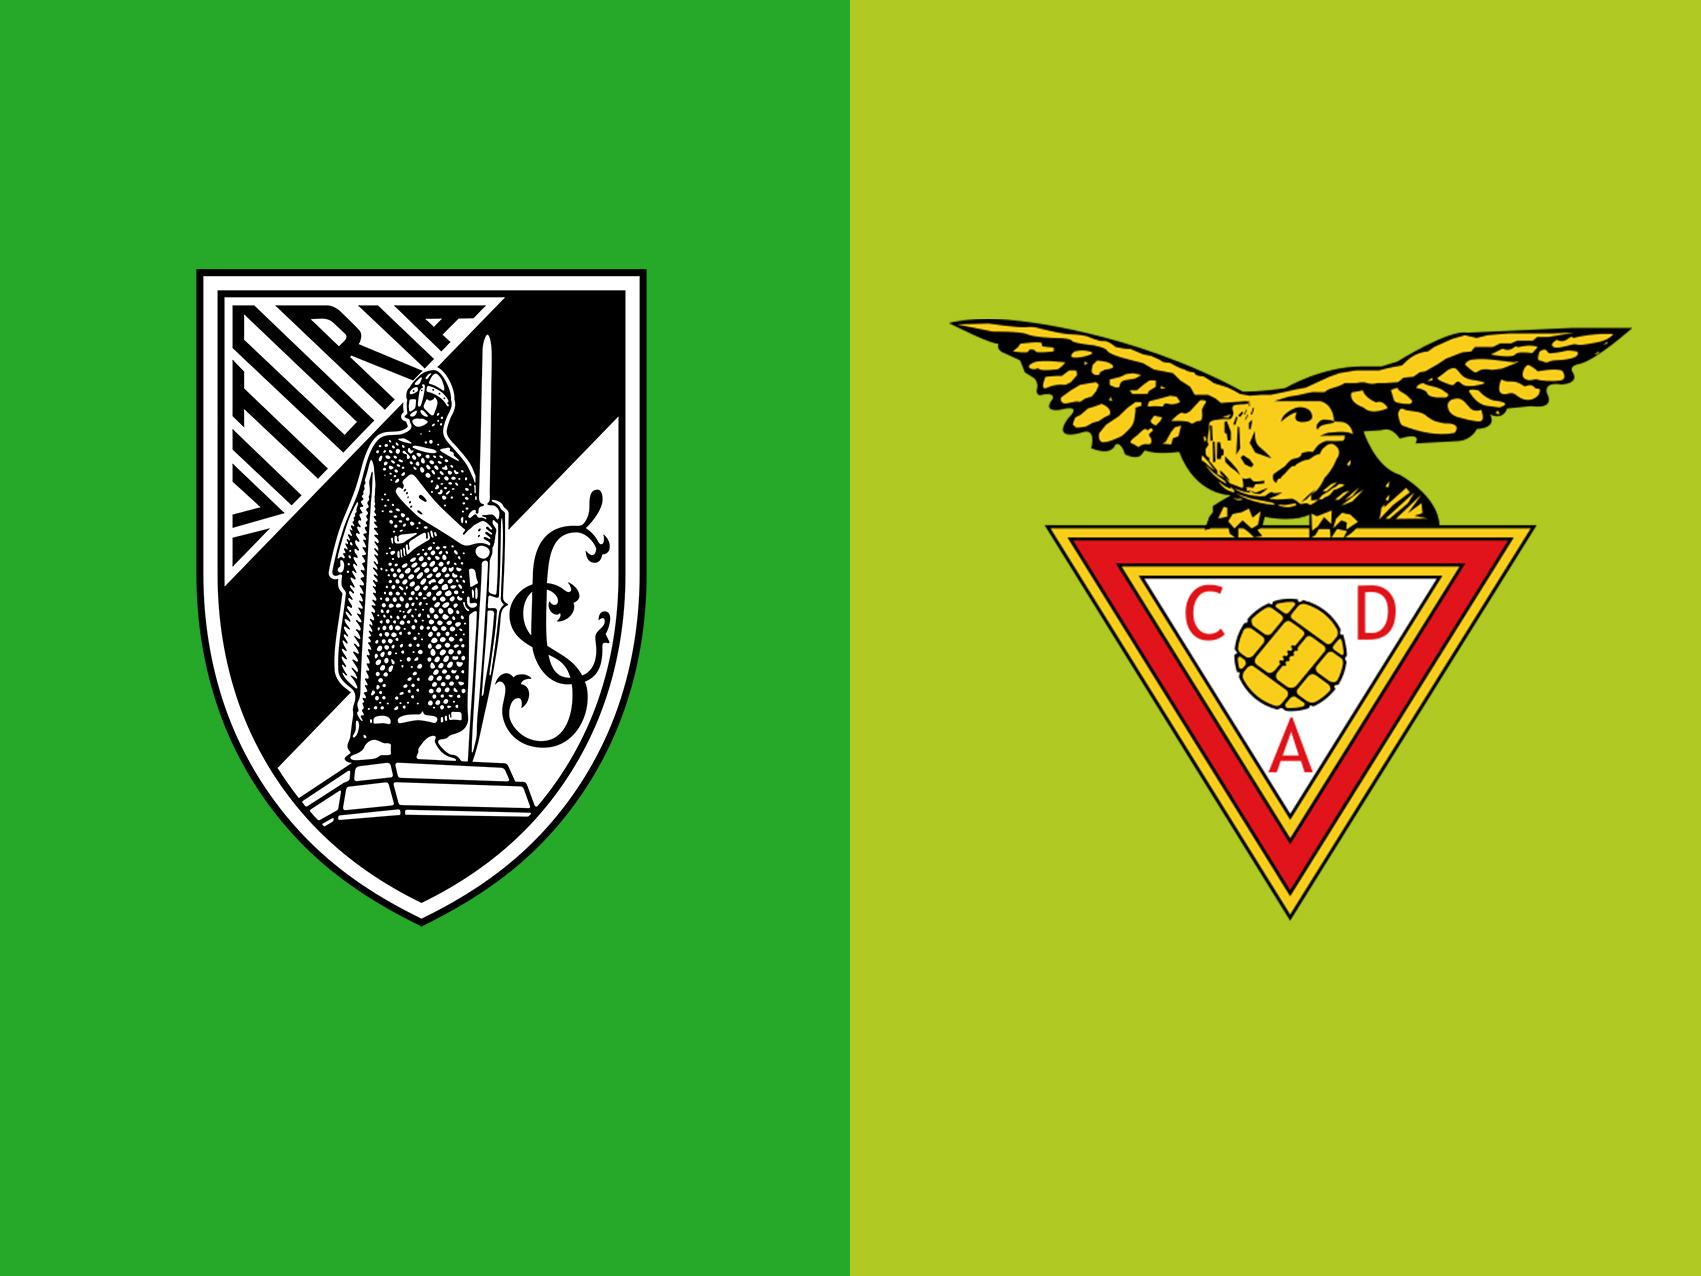 soi-keo-ca-cuoc-bong-da-ngay-20-4-slavia-praha-vs-Aves-cong-pha-phao-dai-b9 1